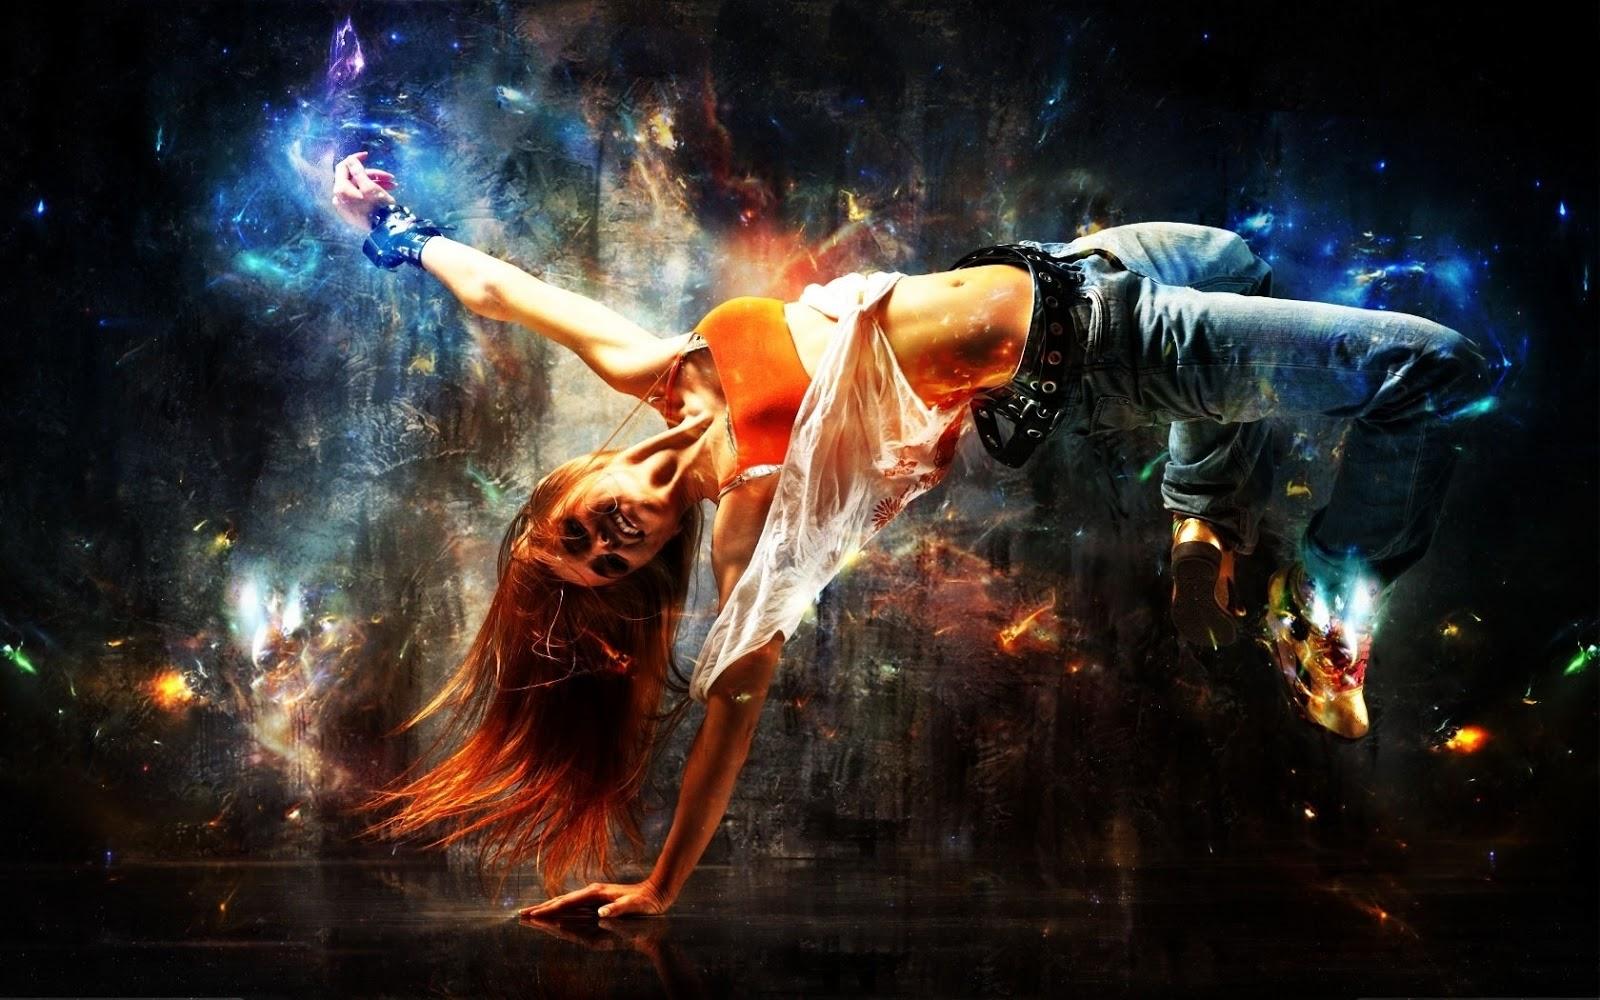 3d Dance Wallpapers For Desktop Hd 500x500 3d Dance: Wallpaper Desk : Dance Hd Wallpaper, Dance